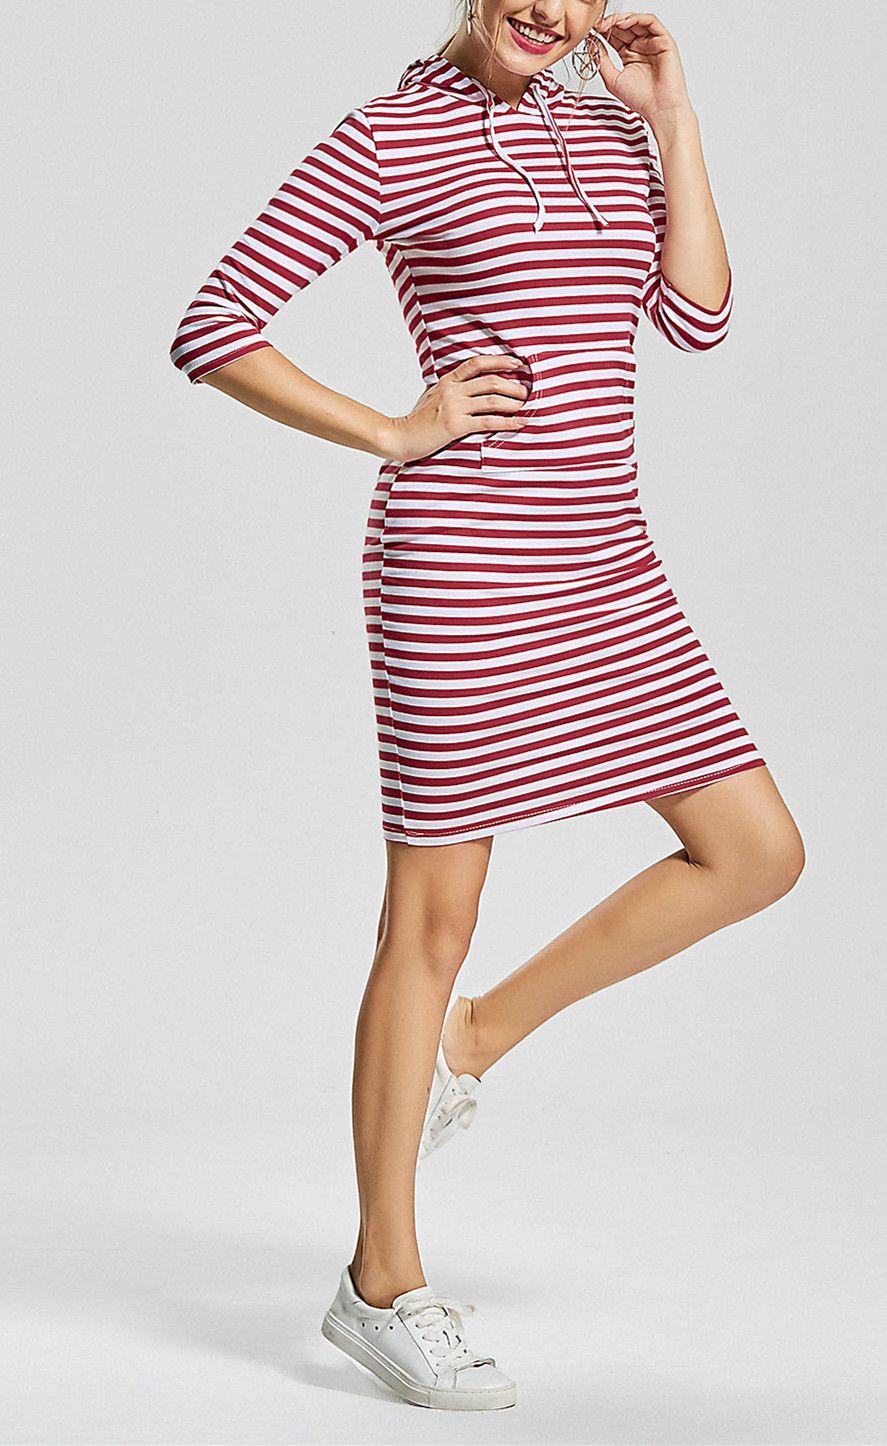 Kangaroo Pocket Striped Hoodie Dress | clothes | Pinterest ...